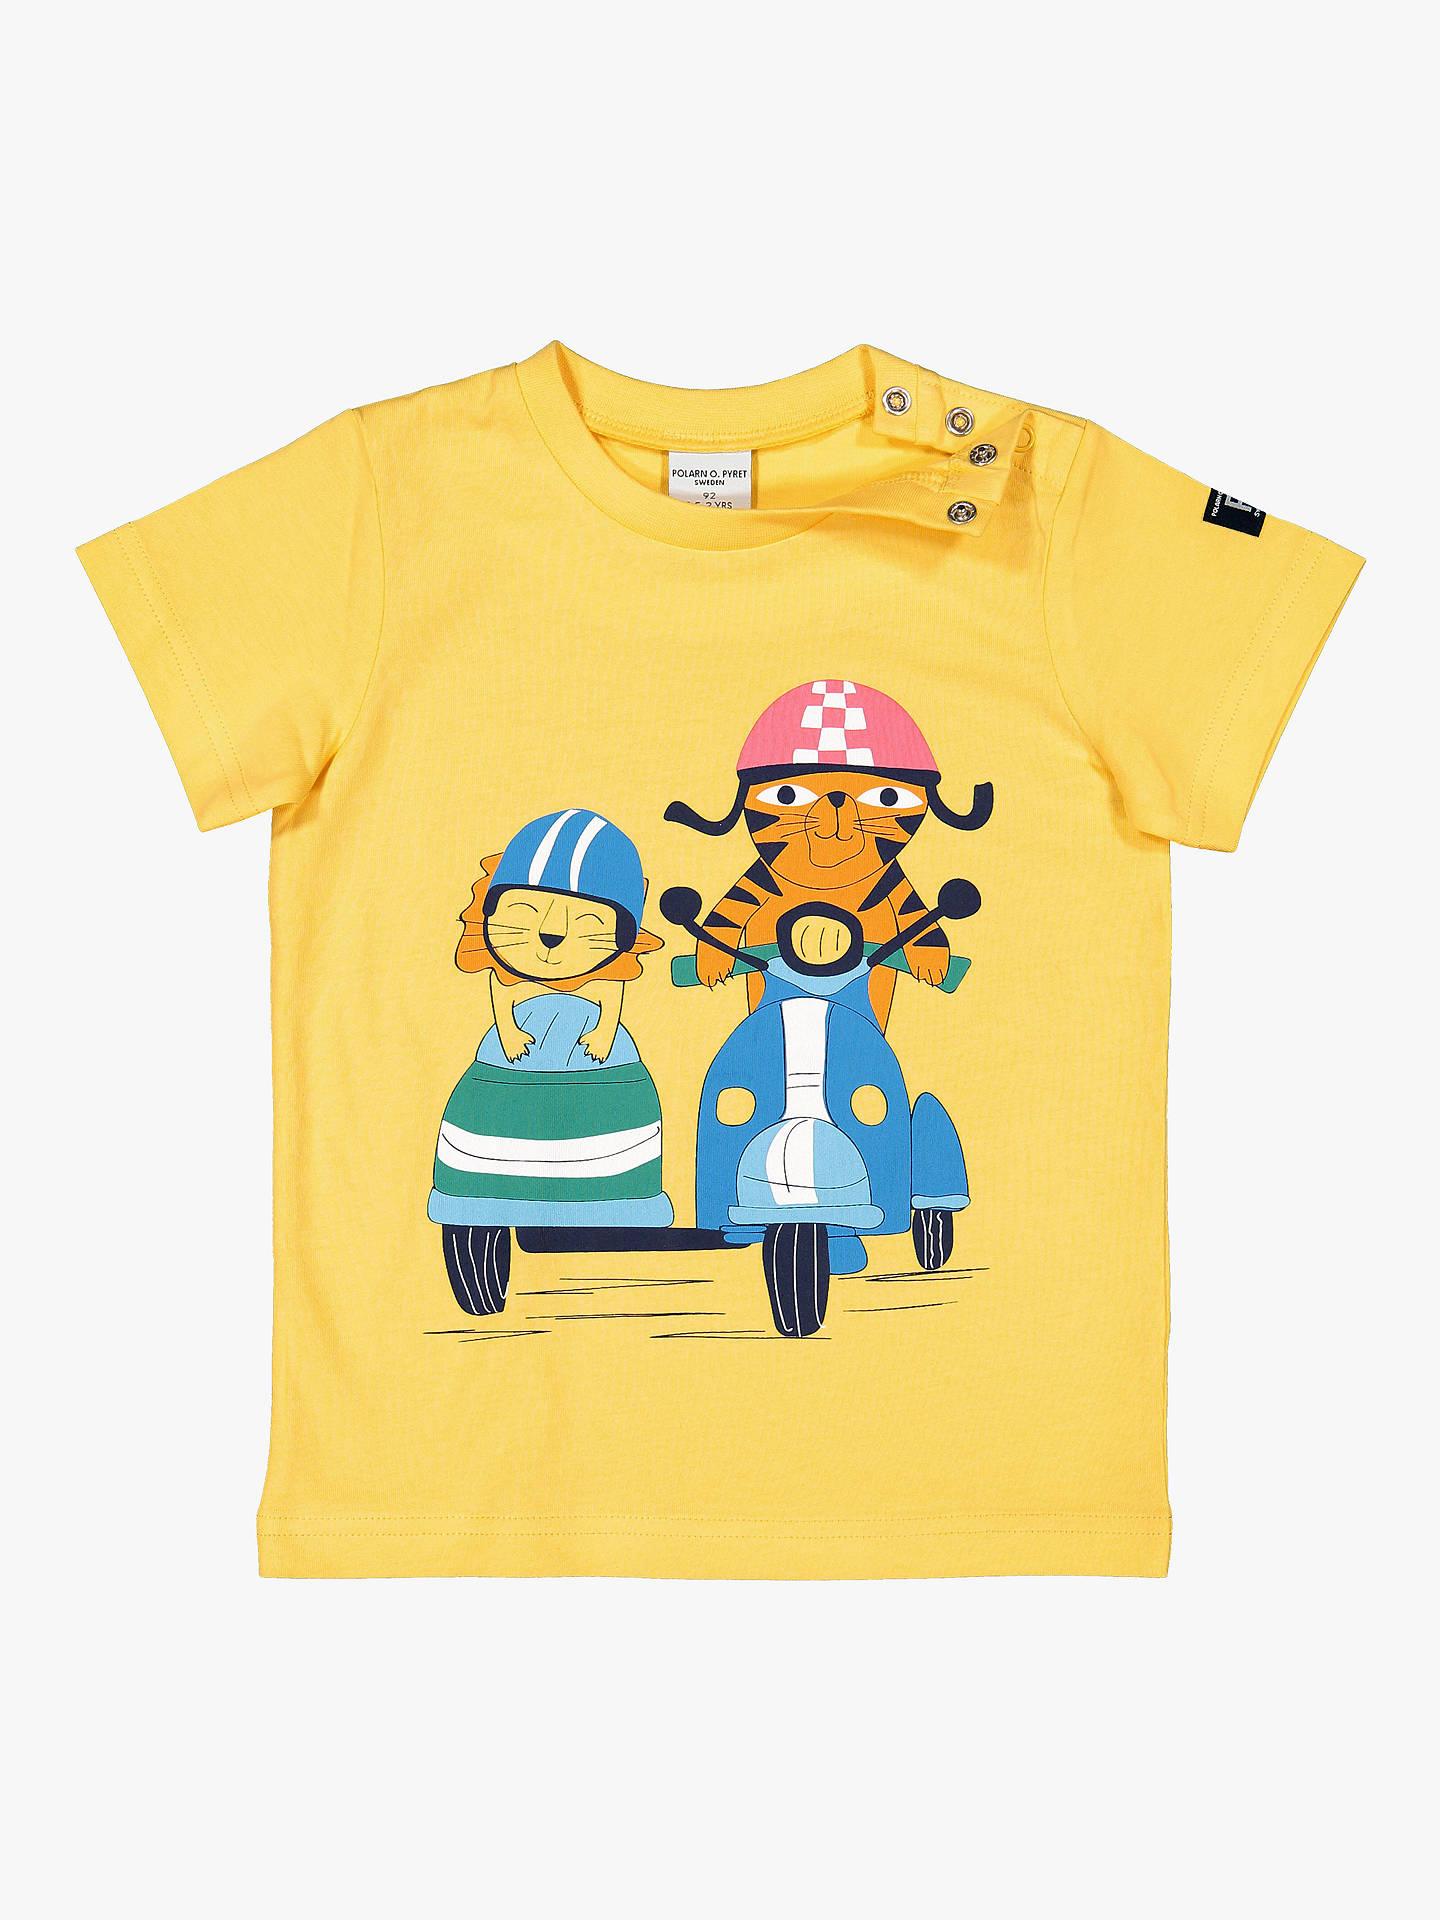 047f2a48 ... Buy Polarn O. Pyret Children's Surf Van Graphic T-Shirt, Yellow, 12 ...